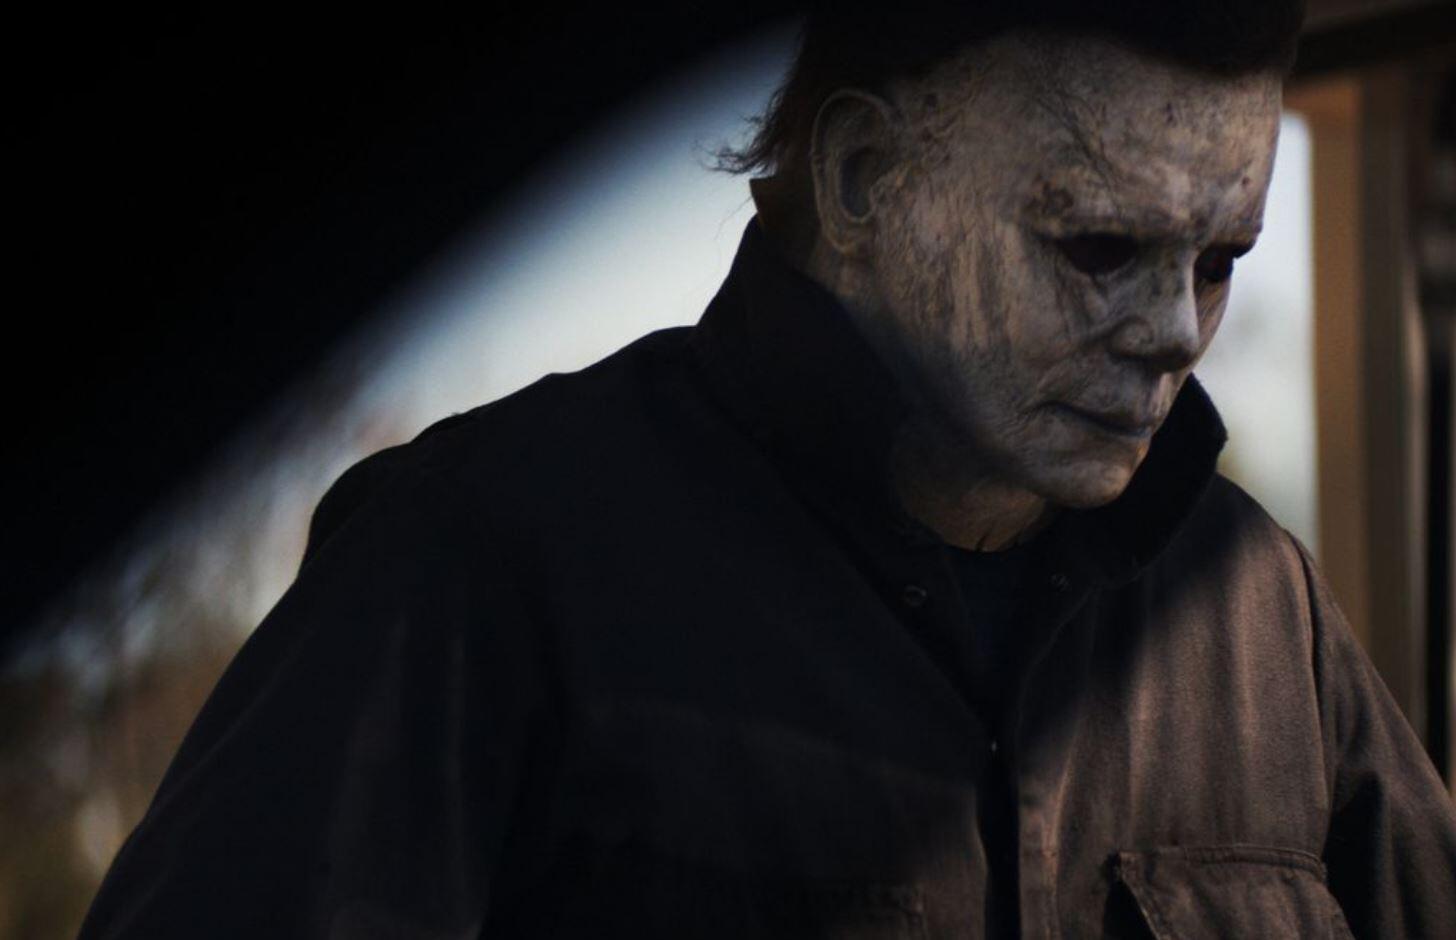 jason blum says he wants to make 10 more  u0026 39 halloween u0026 39  sequels